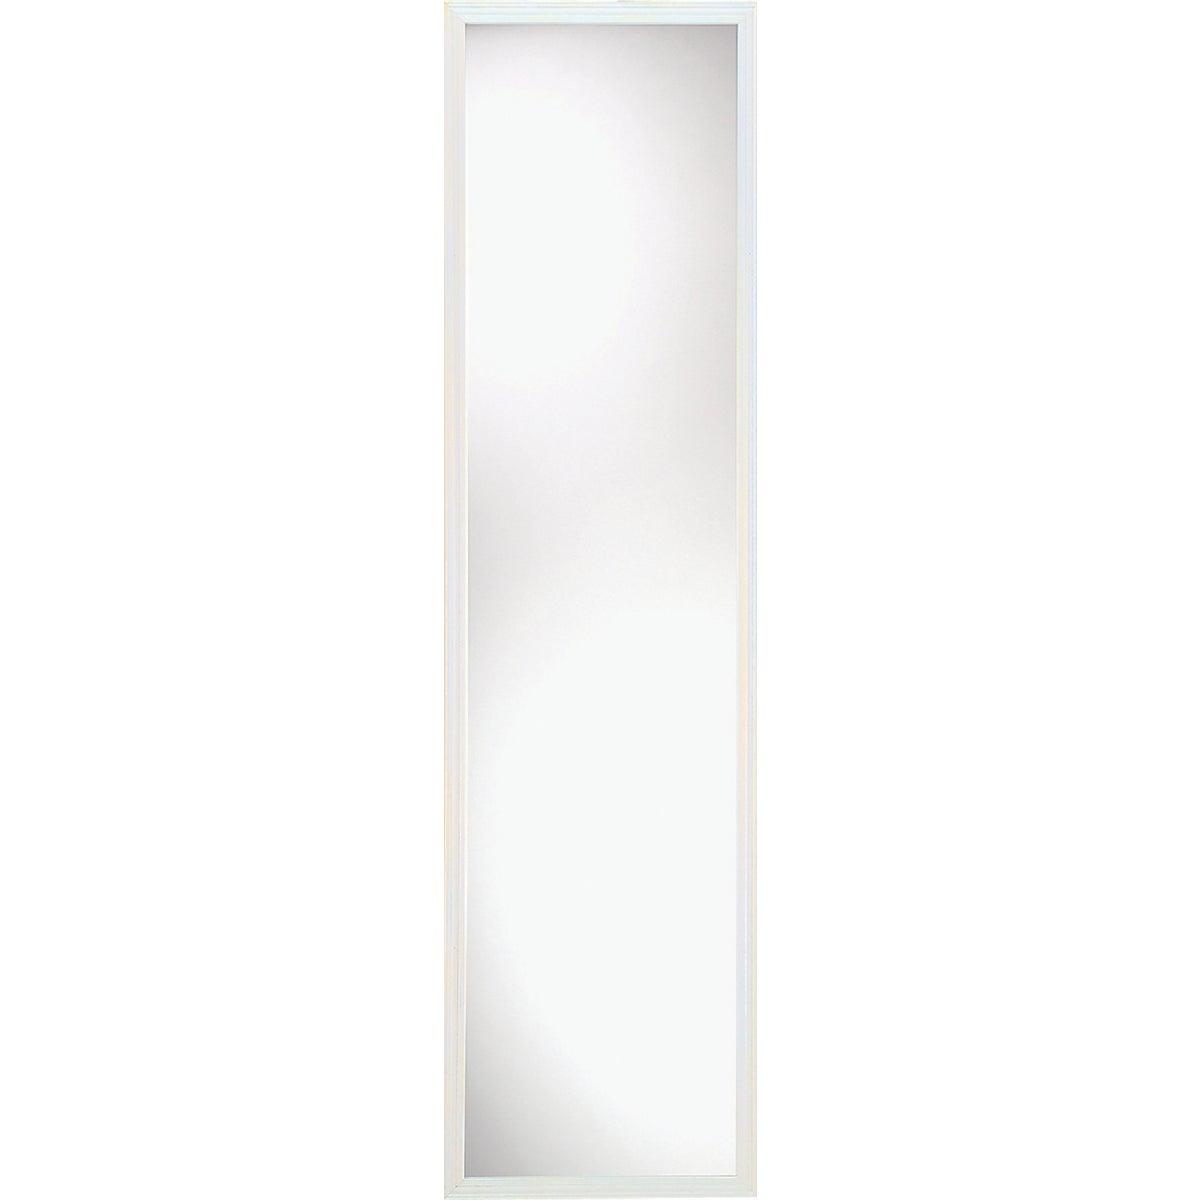 SUAVE WHT DOOR MIRROR - 20-6230 by Home Decor Innovatns